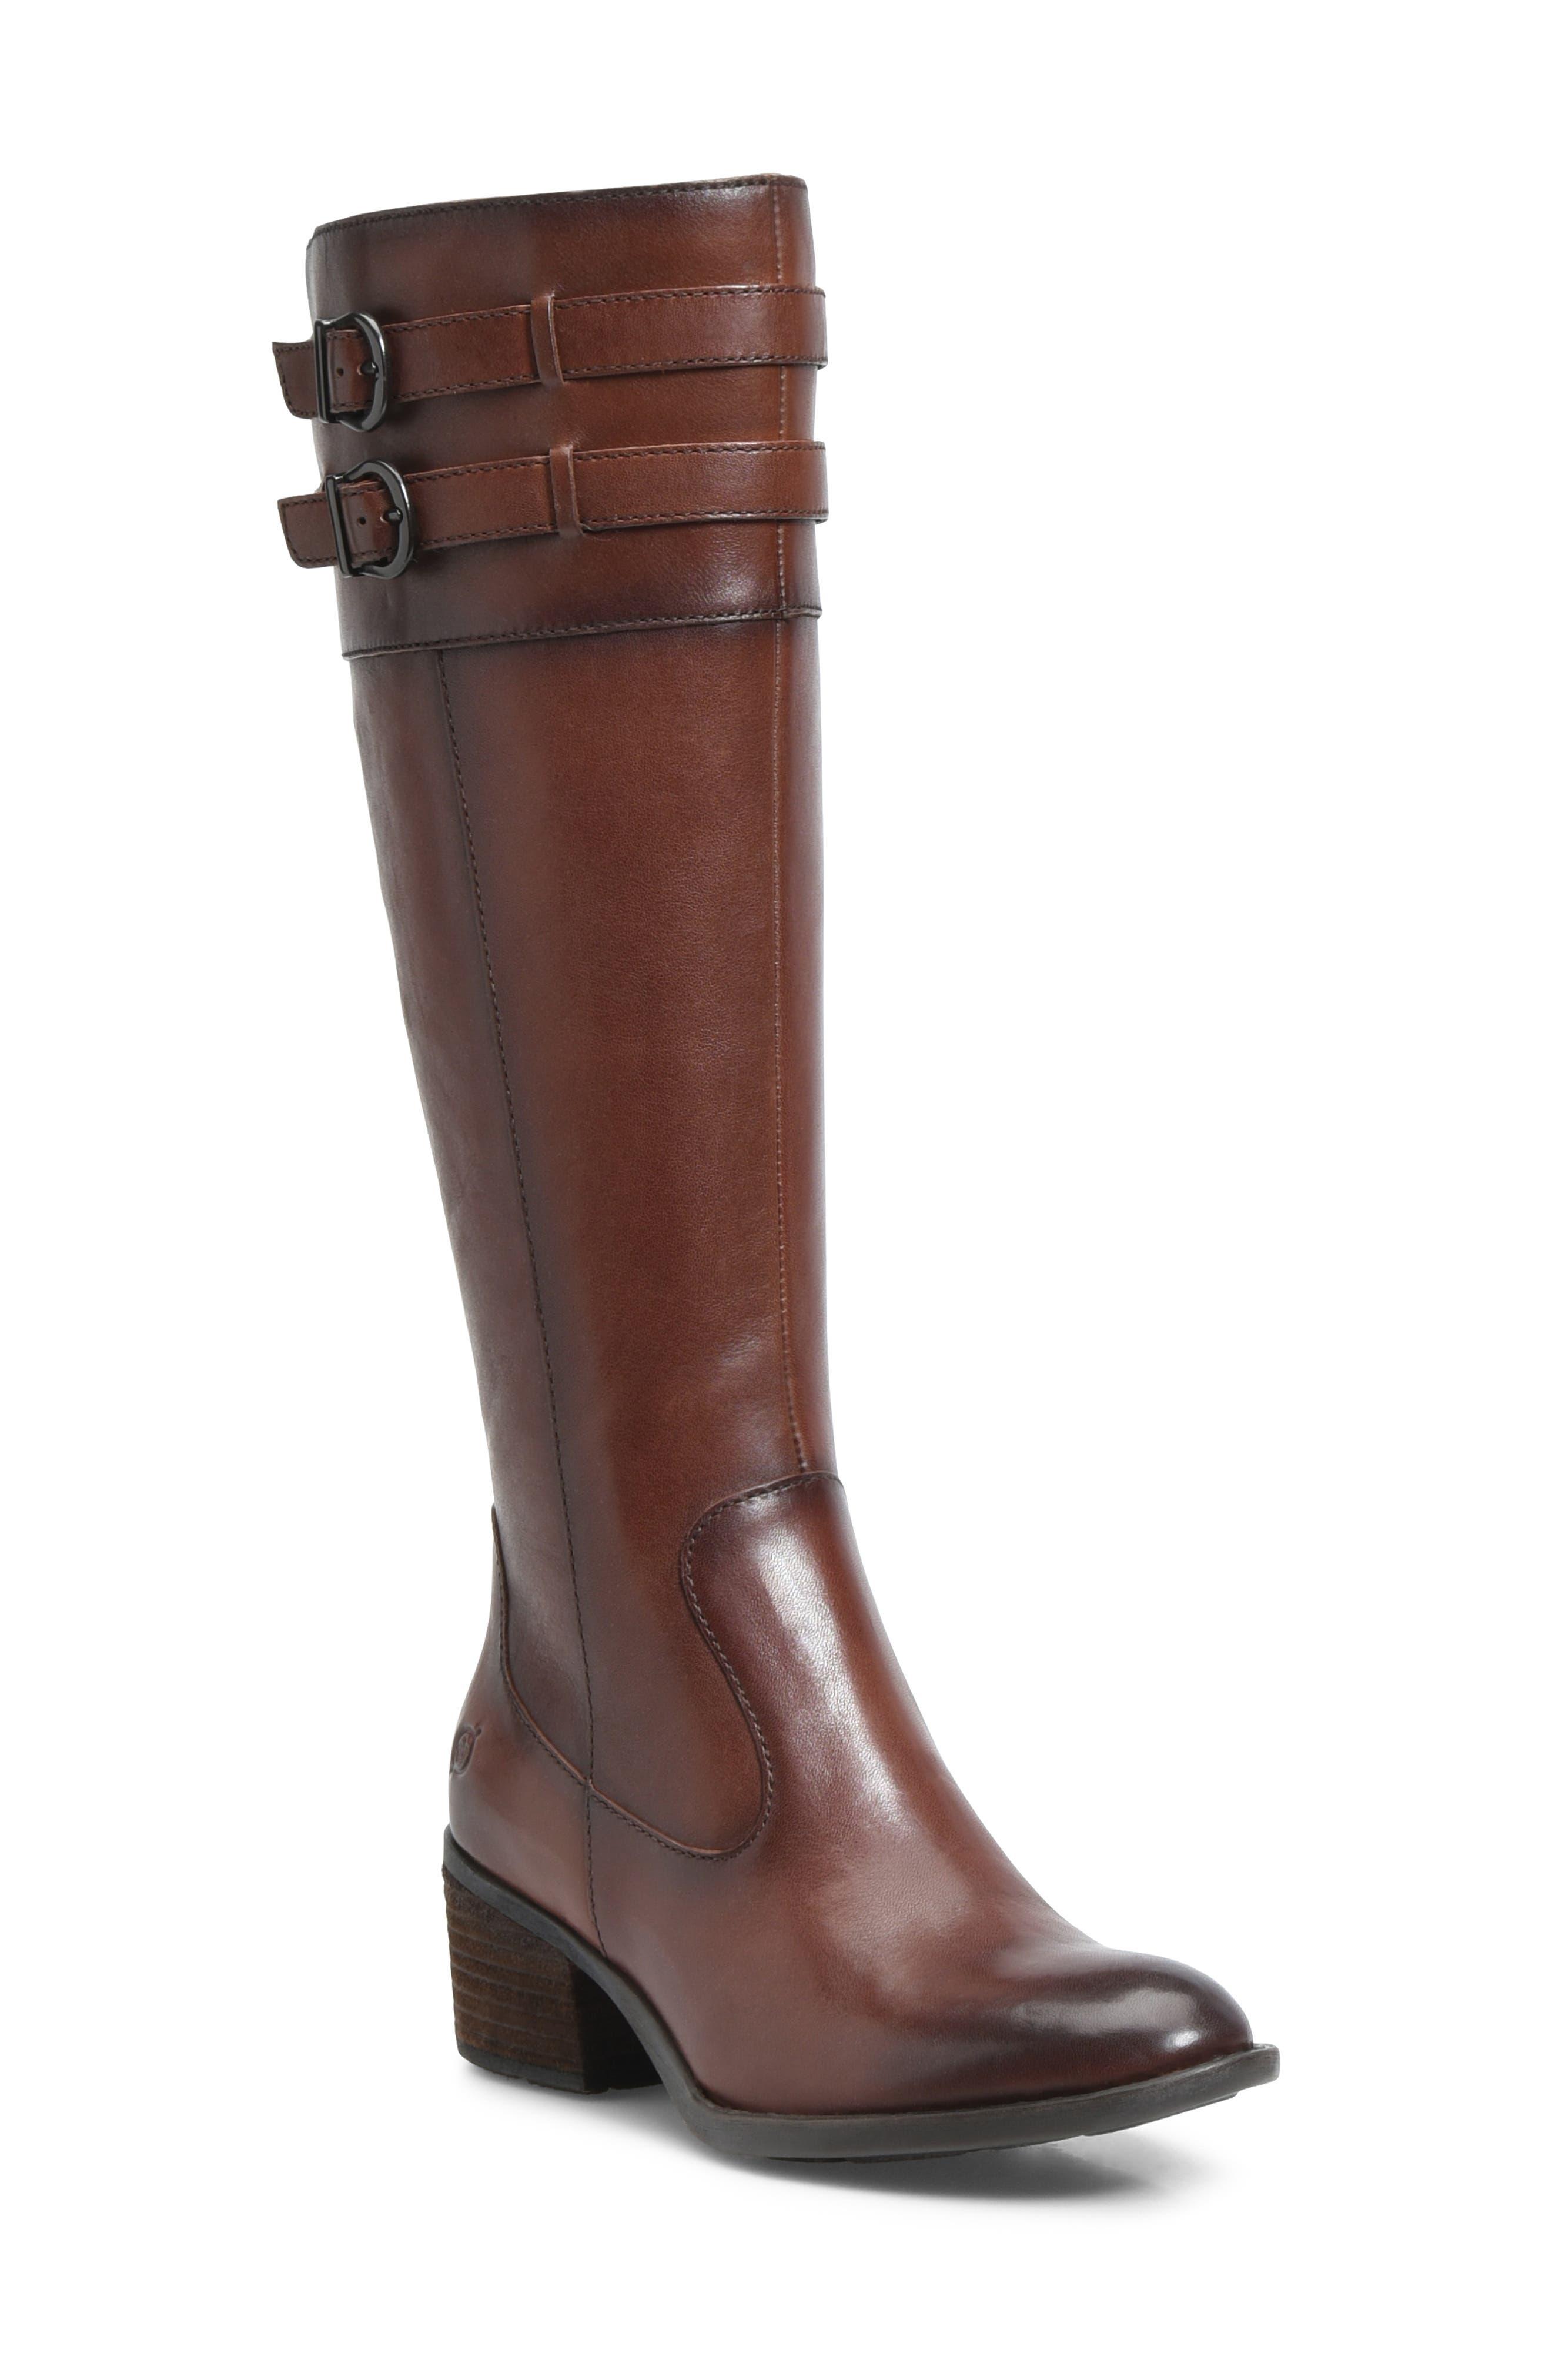 B?rn Tay Block Heel Knee High Boot- Brown